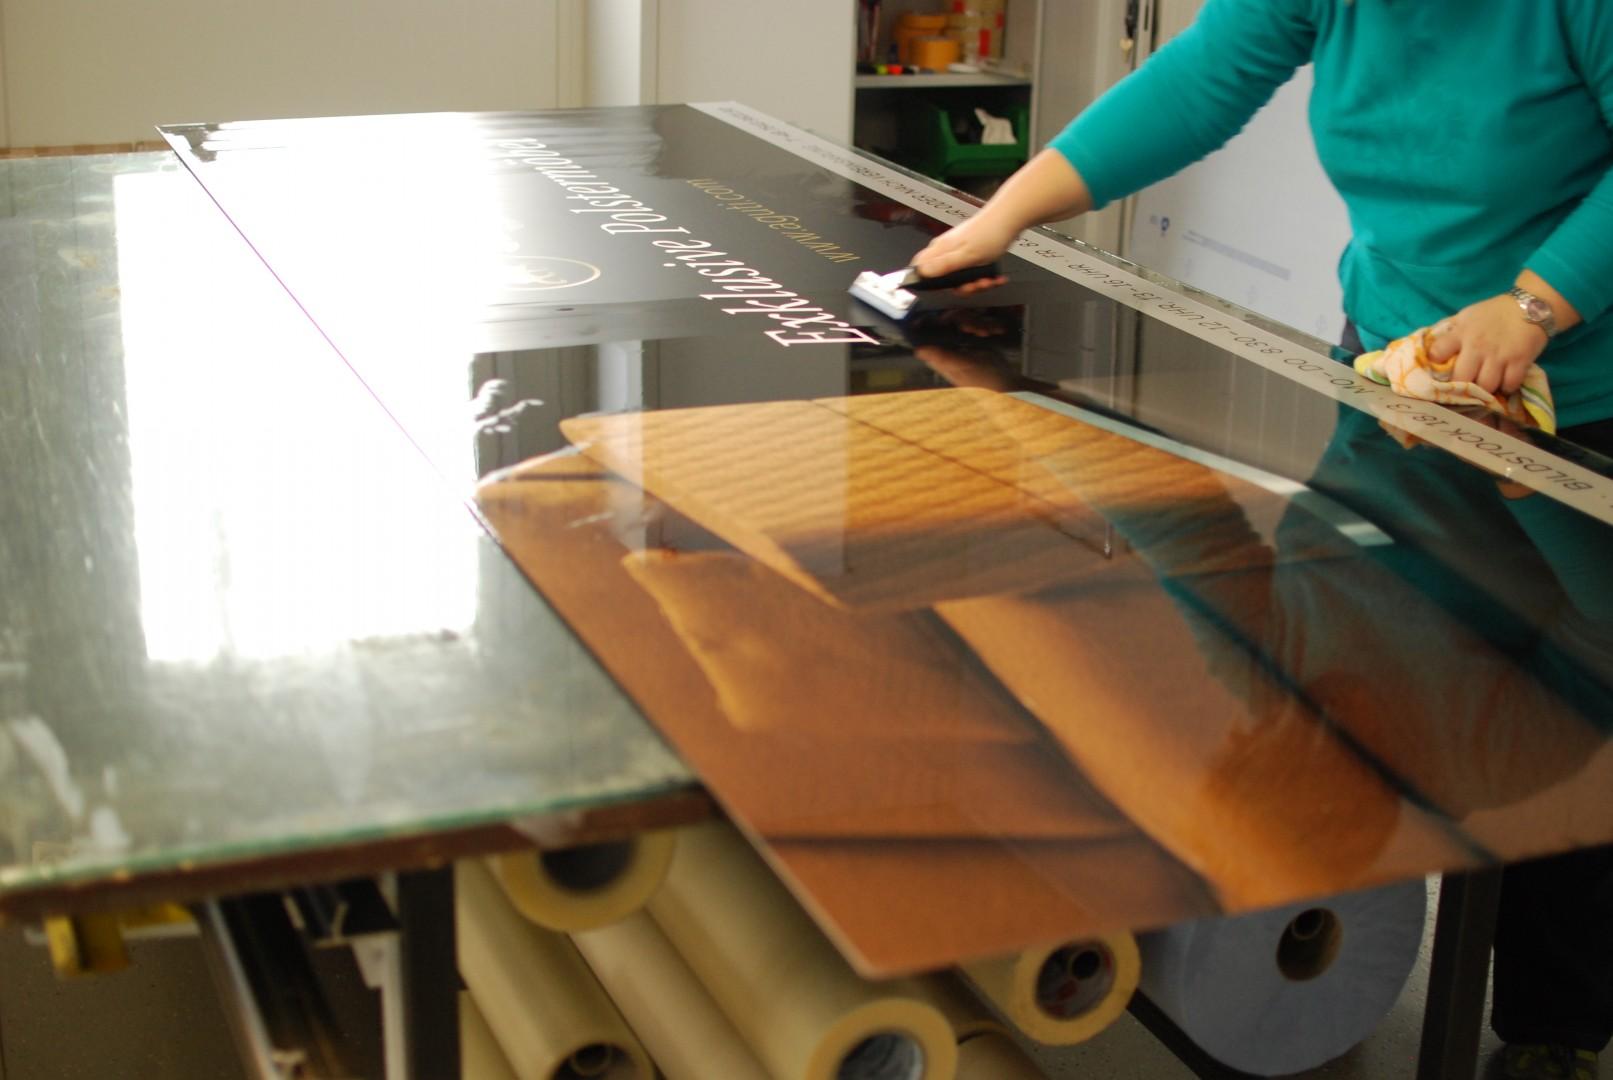 Schilderverklebung Digitaldruck auf Aluminium-Verbundplatte